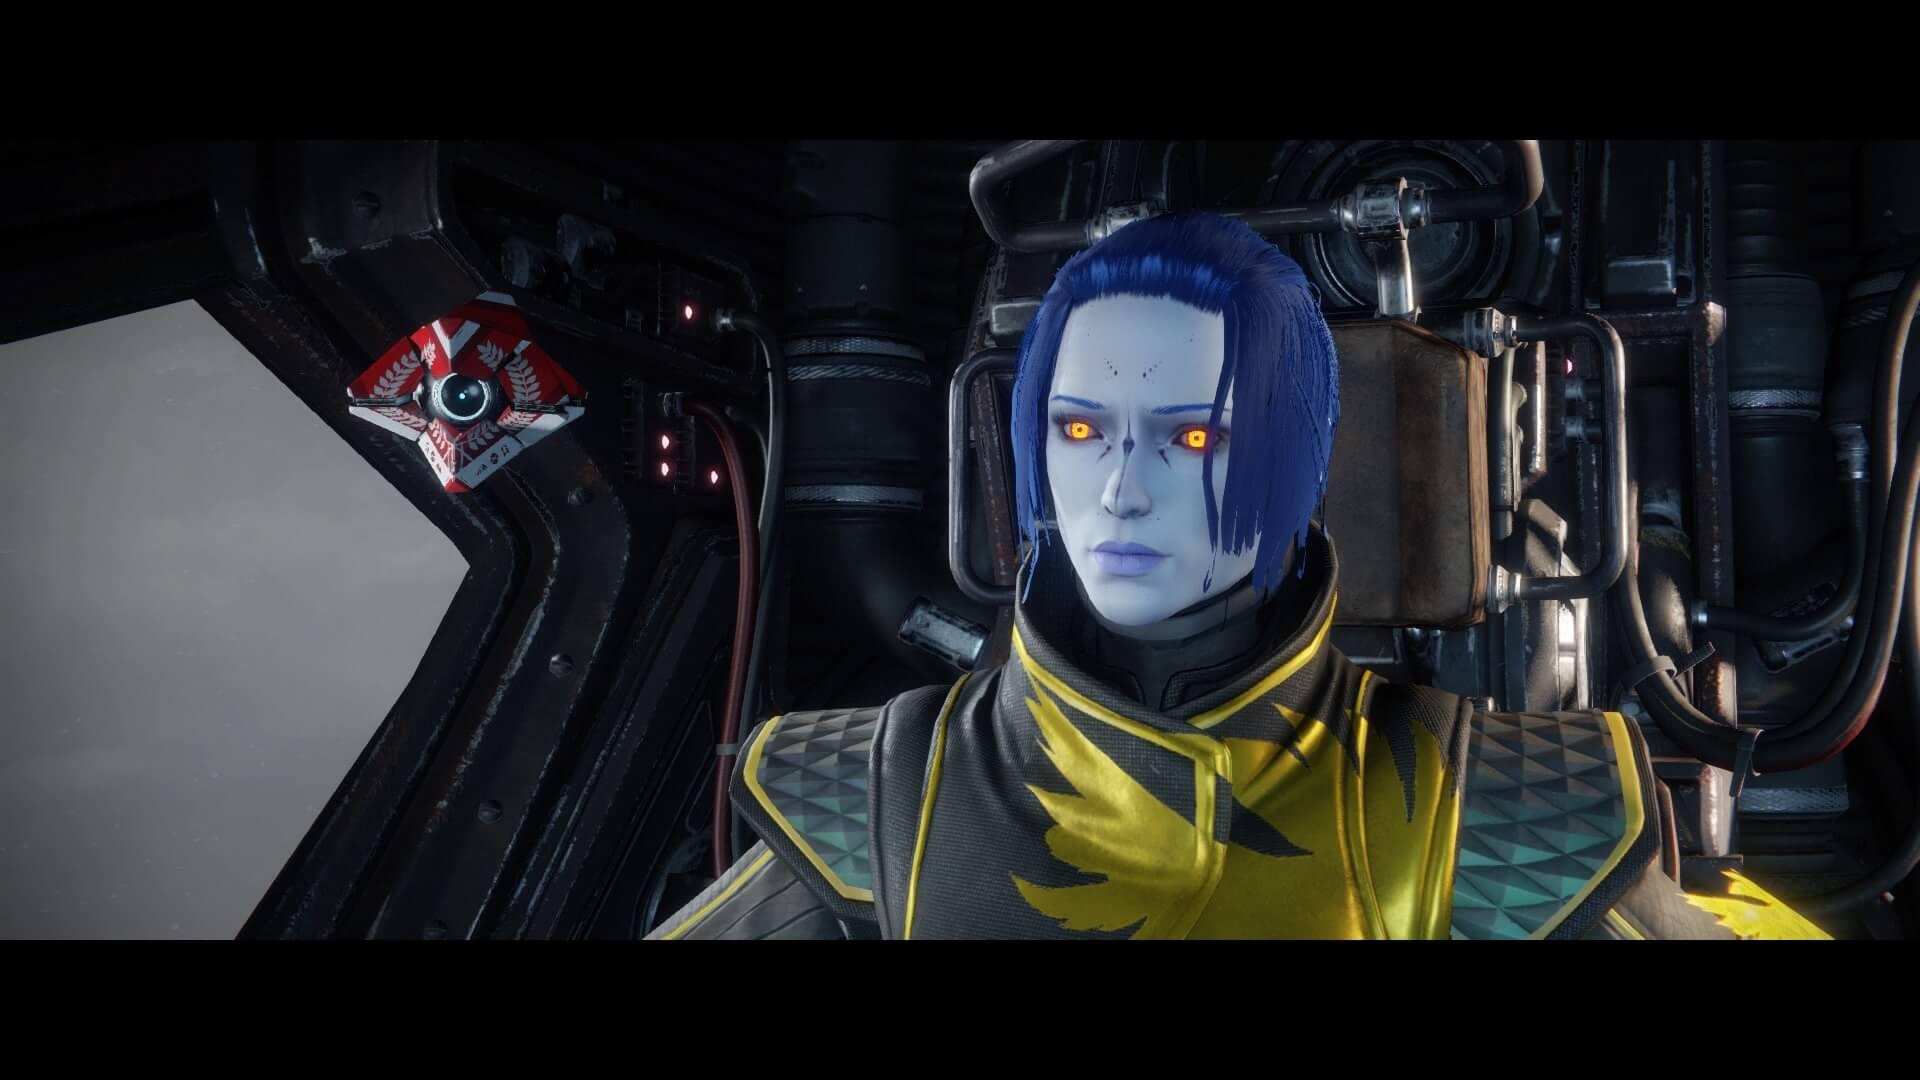 Destiny 2 - personaje dentro de la nave